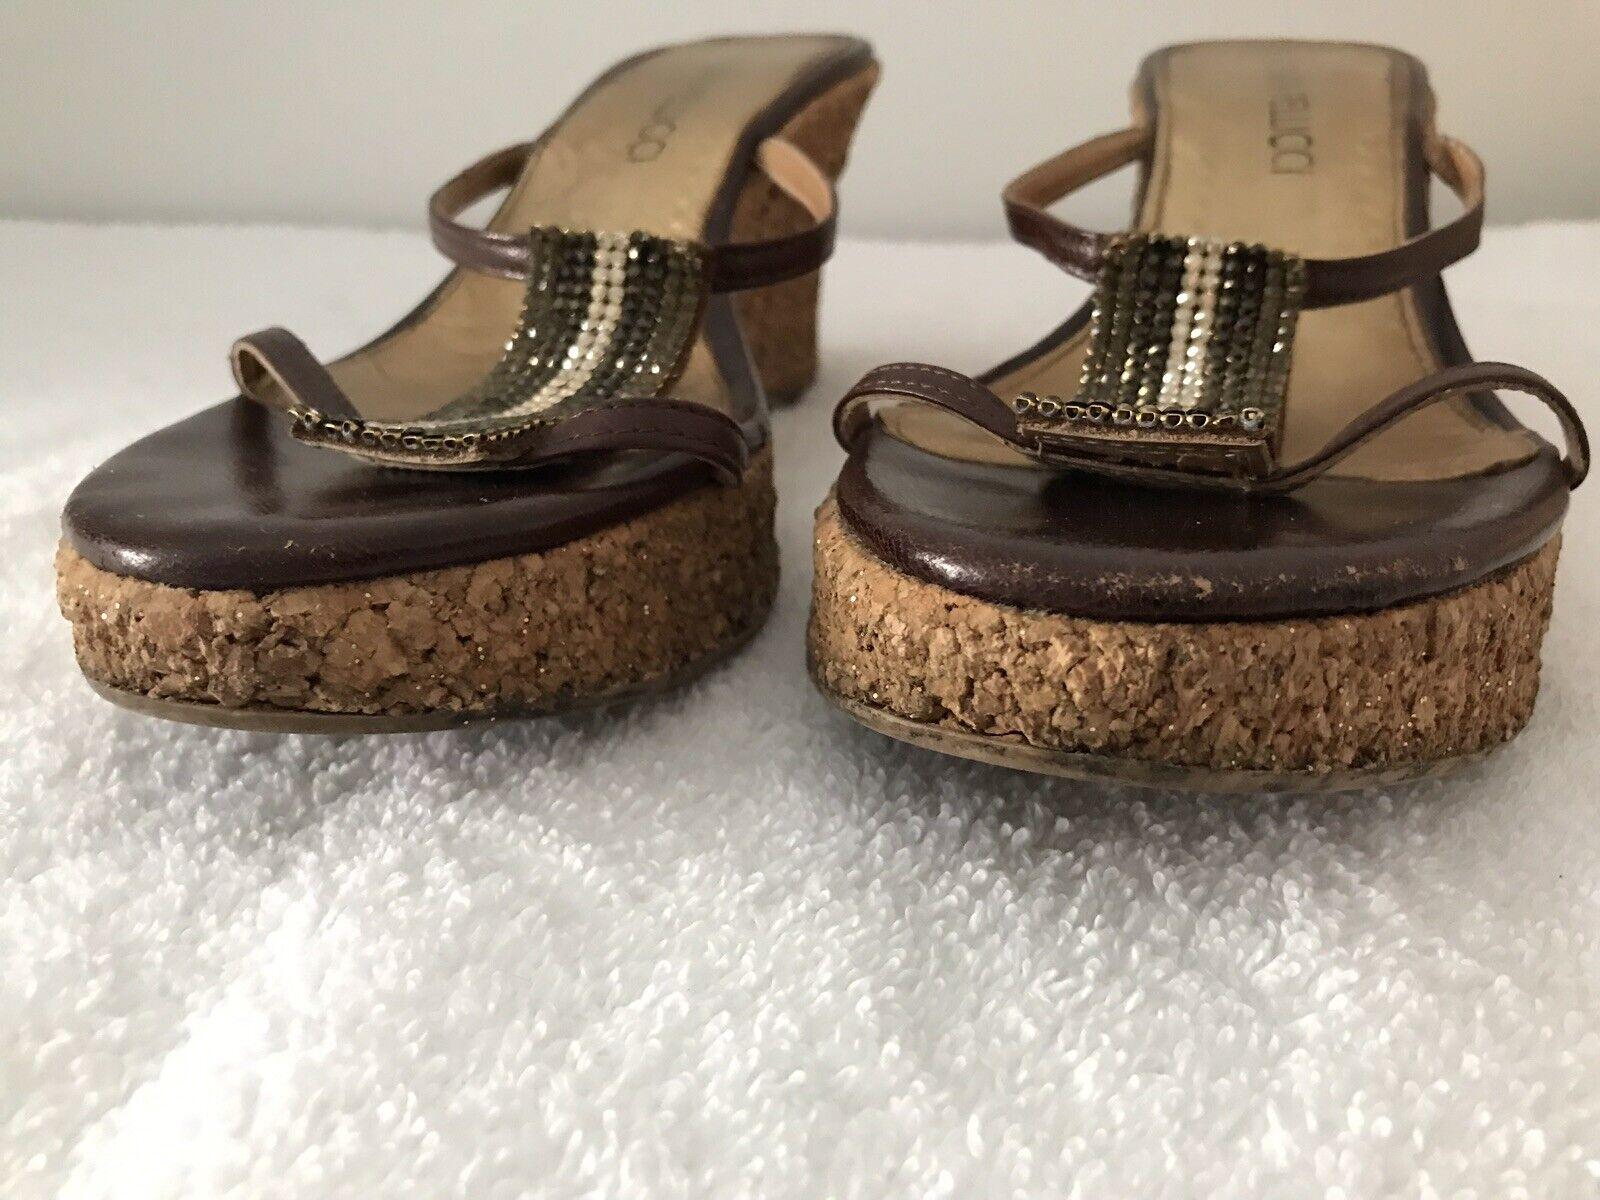 Stefania Stefania Stefania Pellicci shoes Size 40 Europe bdf29b